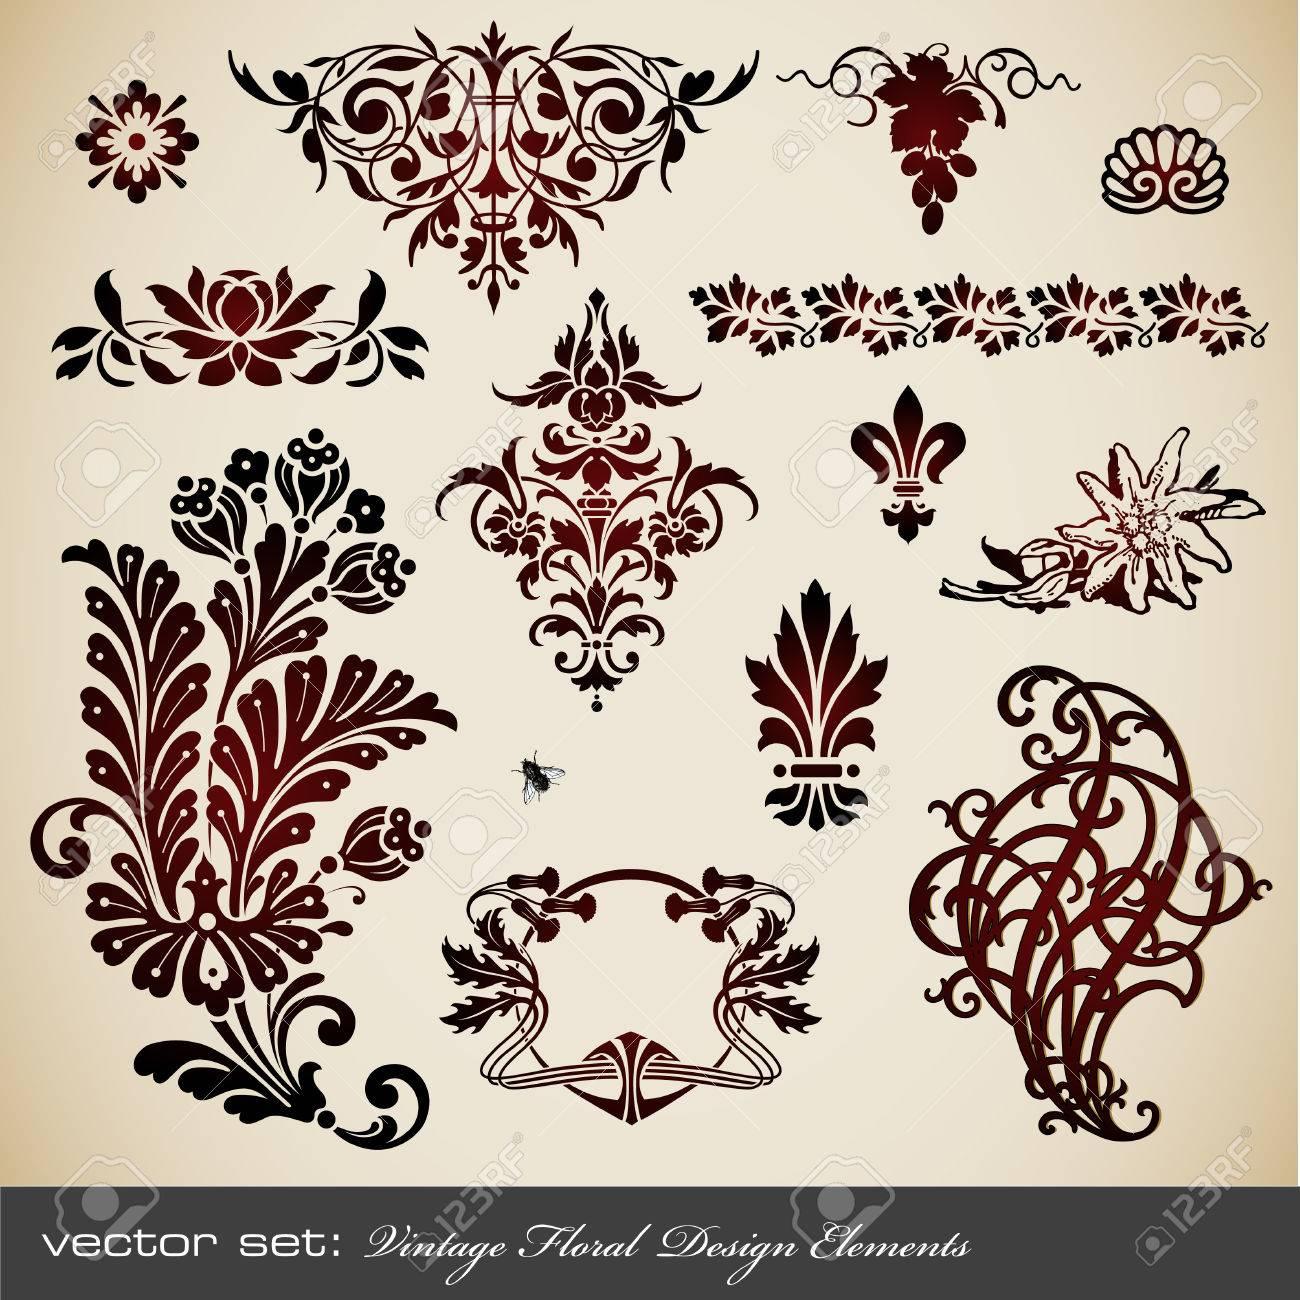 vector set: vintage floral design elements Stock Vector - 5924098